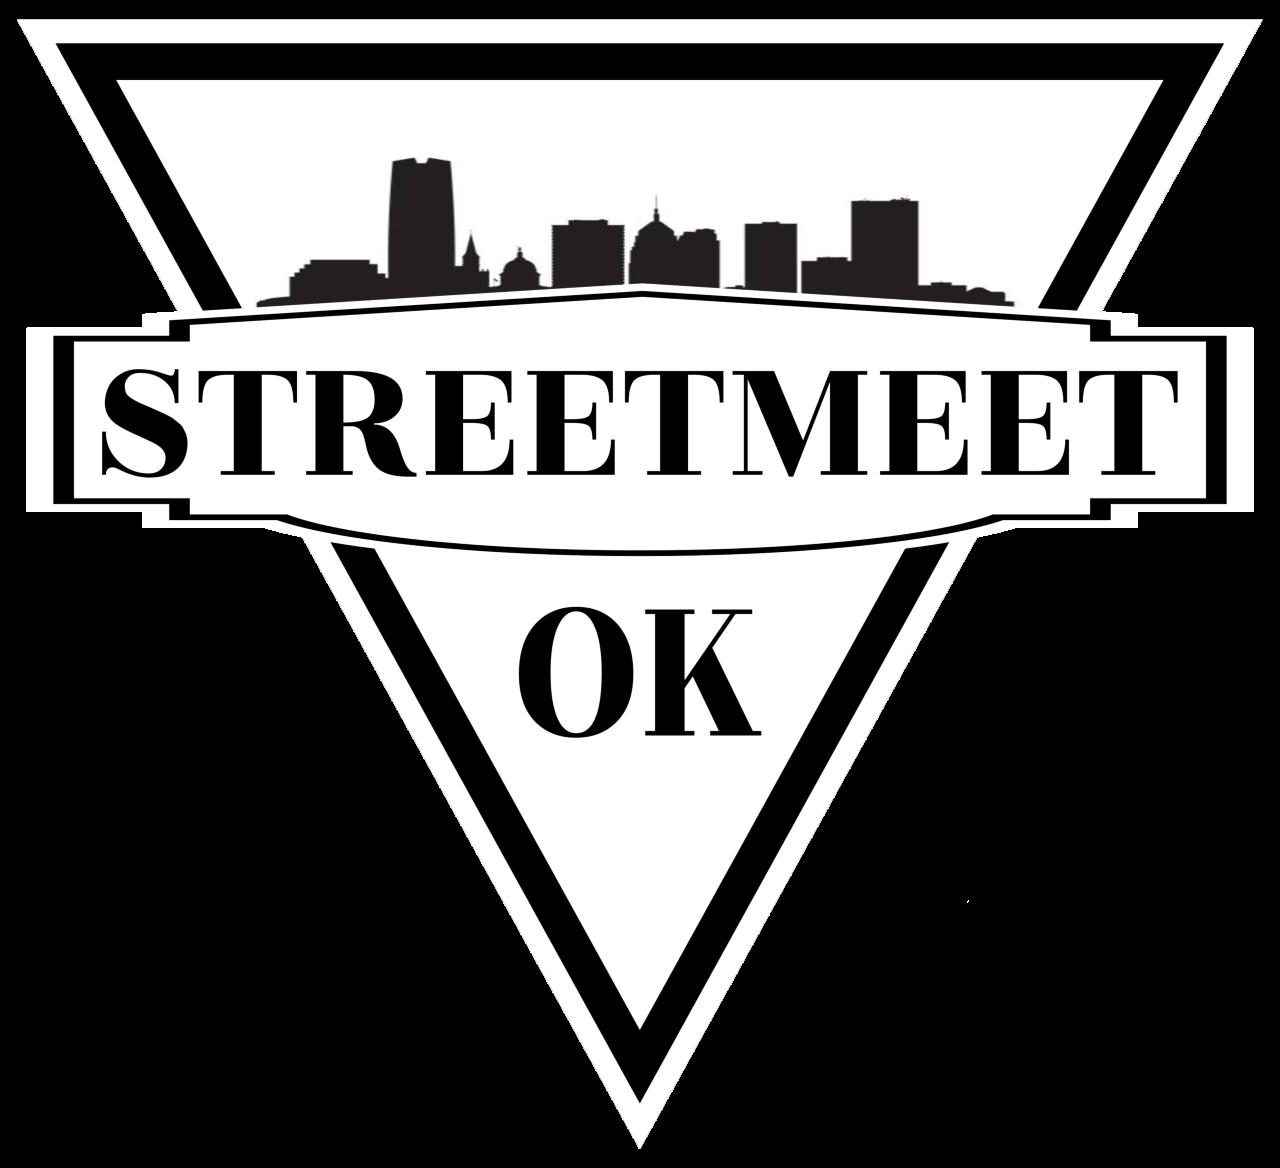 StreetMeetOK